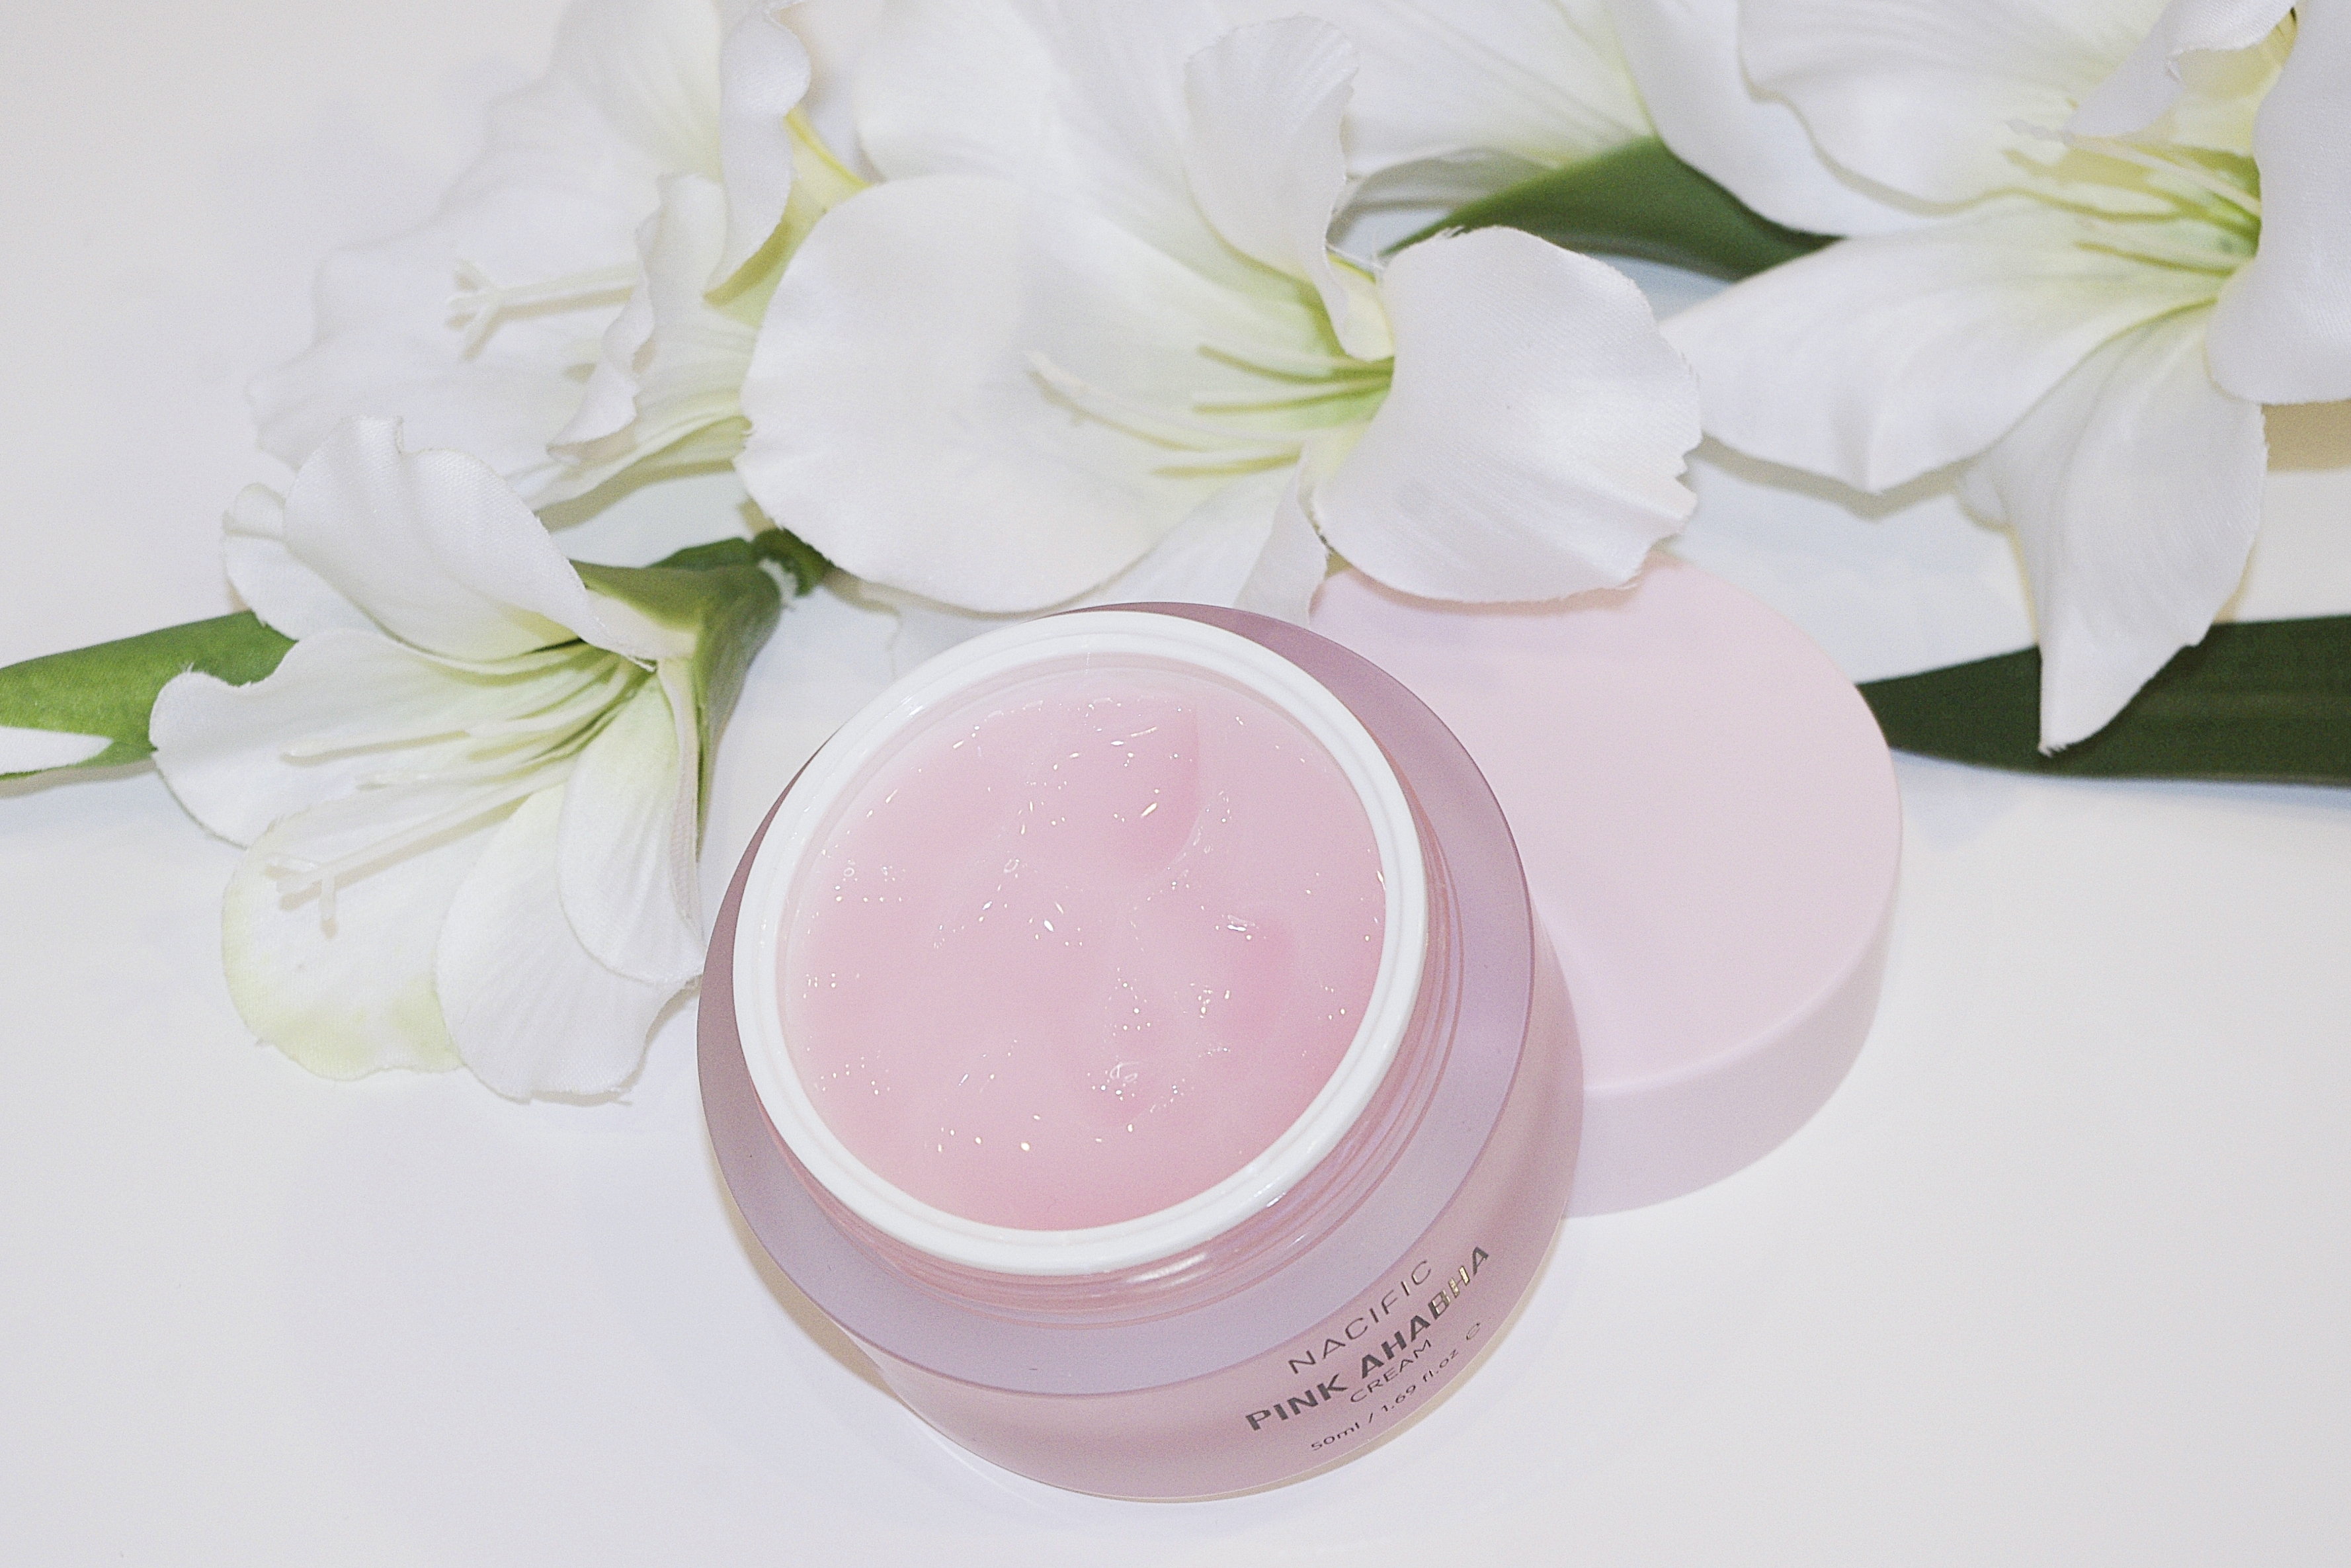 Nacific Pink AHABHA Cream